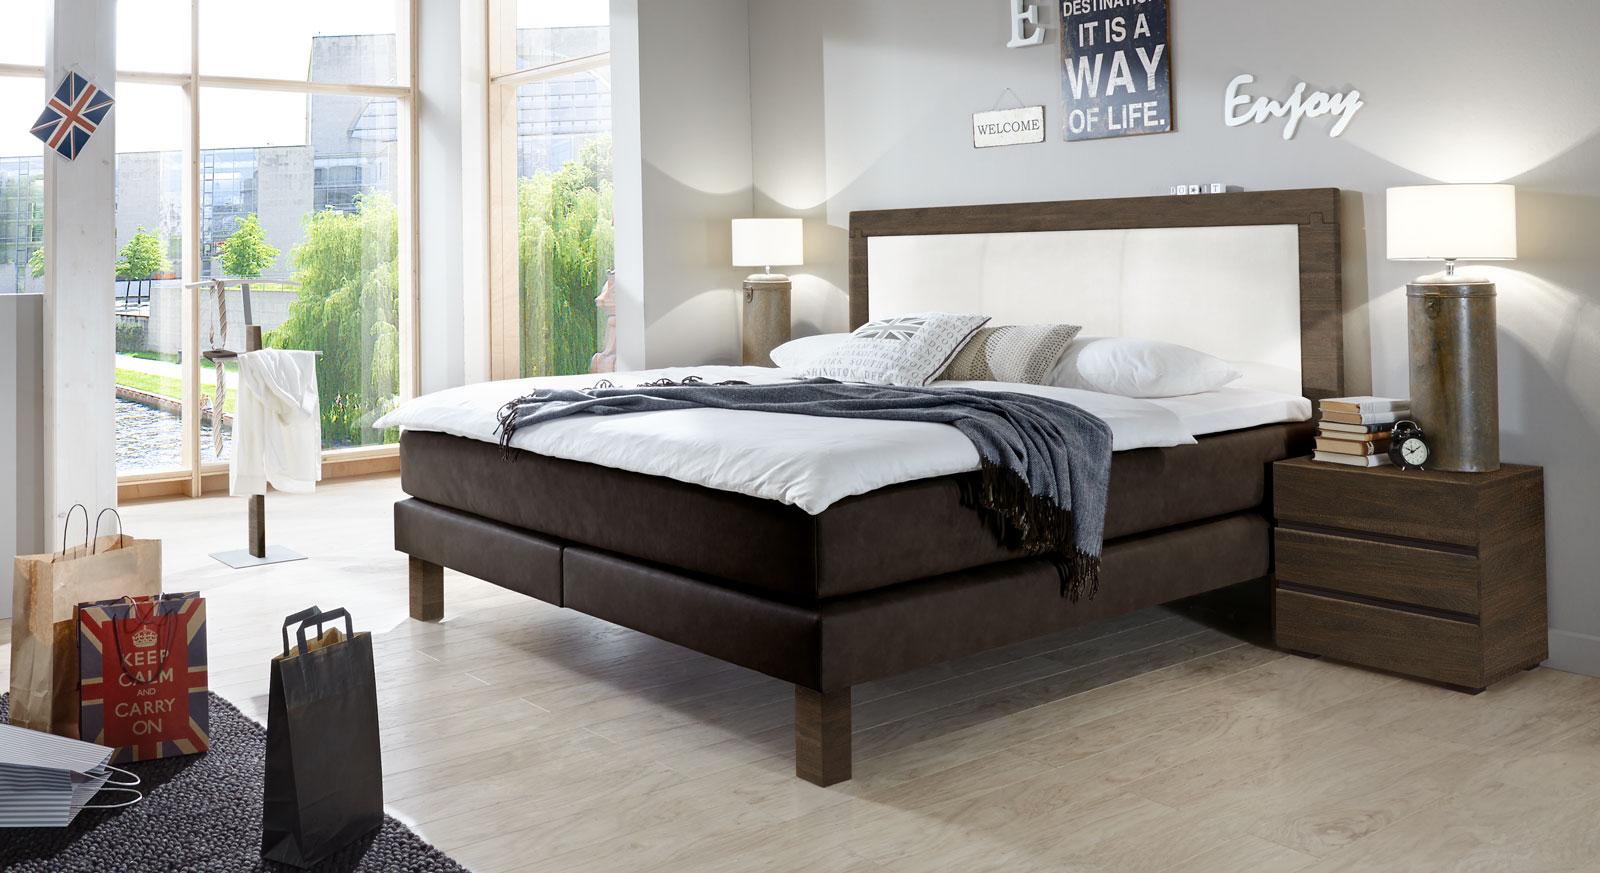 bett test optimiert. Black Bedroom Furniture Sets. Home Design Ideas